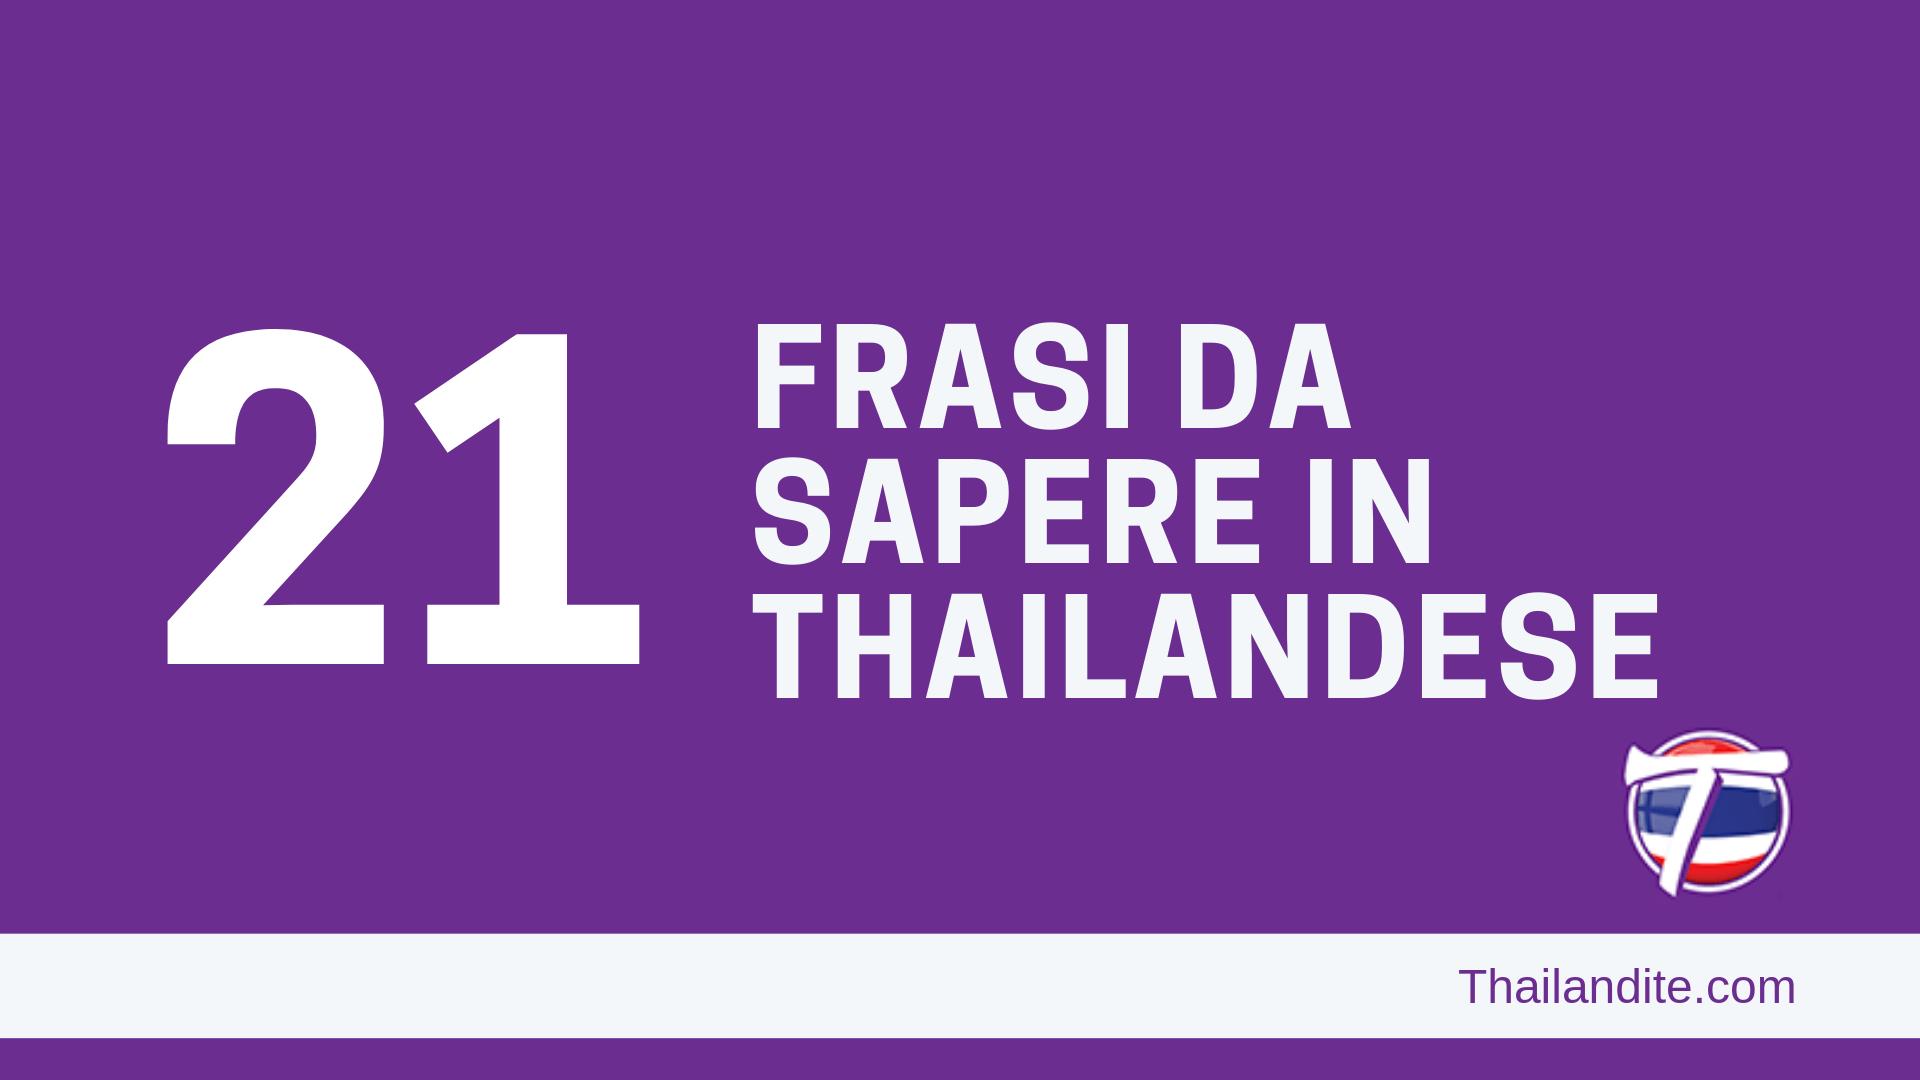 21 Frasi Essenziali Da Sapere in Thailandese